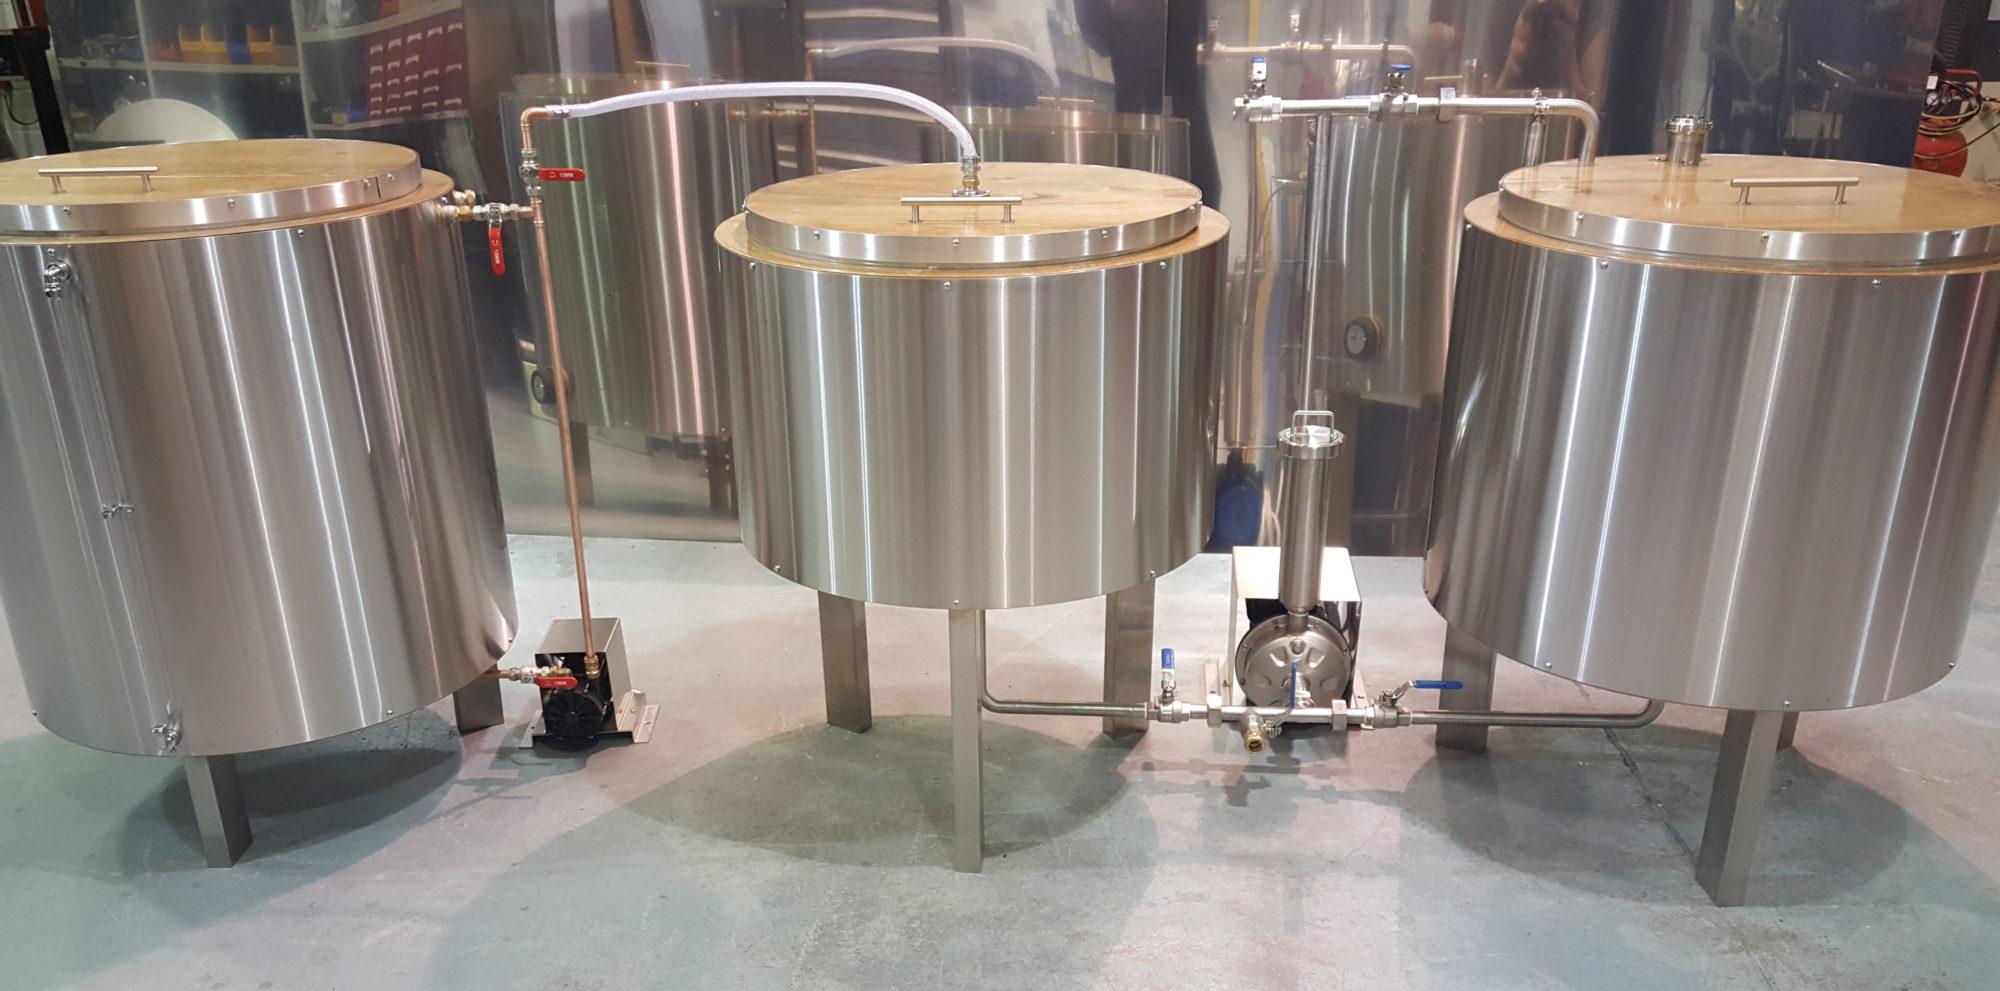 ES Fabrications – Stainless Steel Fabricators